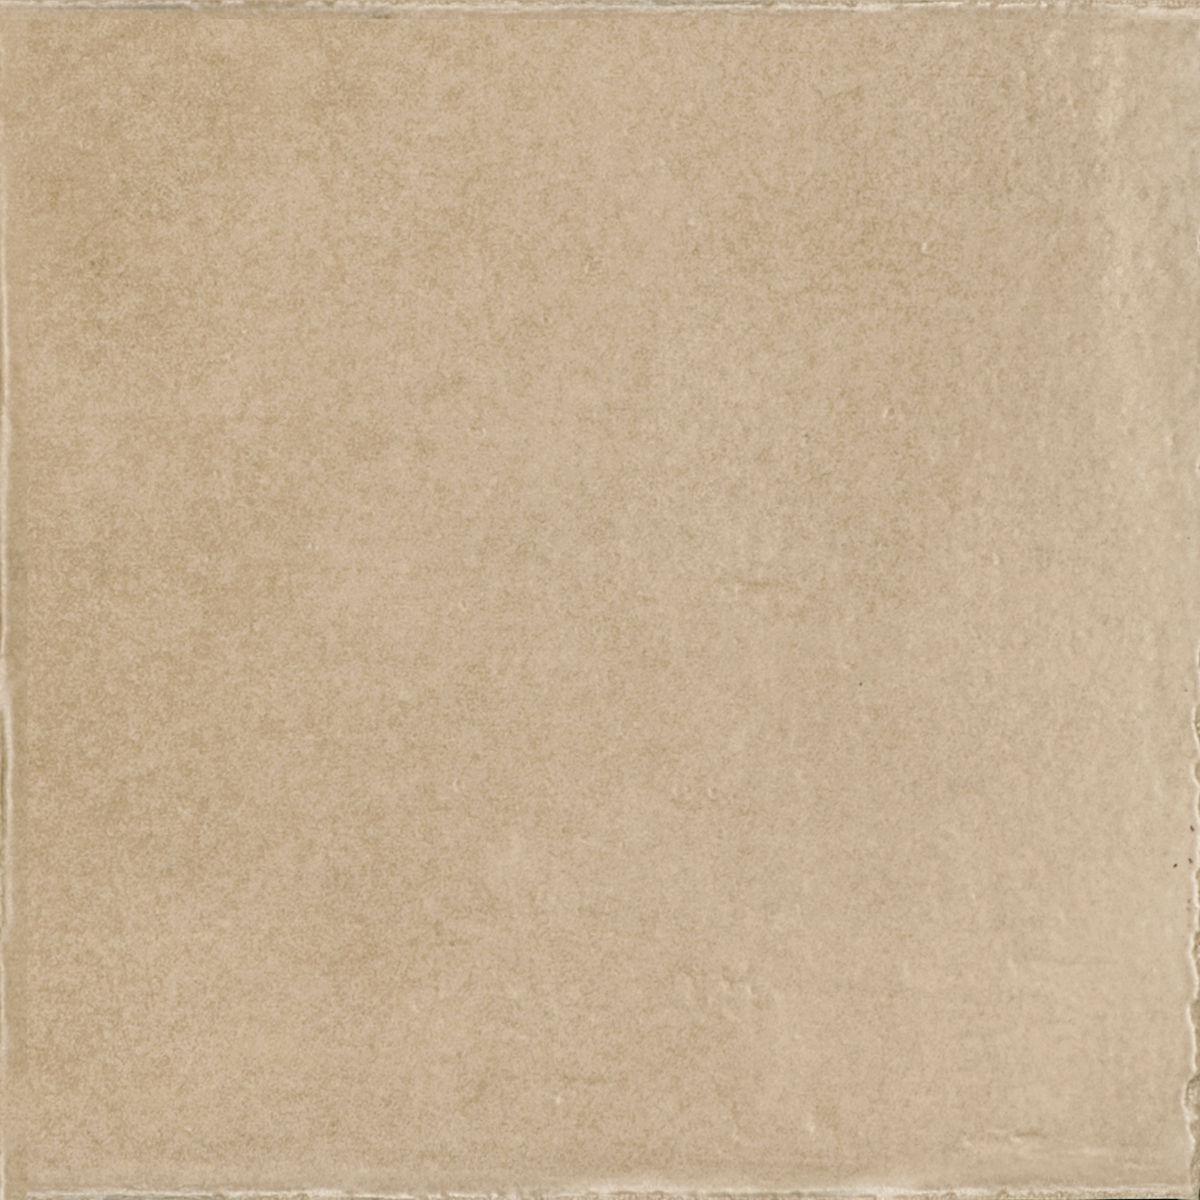 Плитка LINO Lino (zgxca3) изображение 1